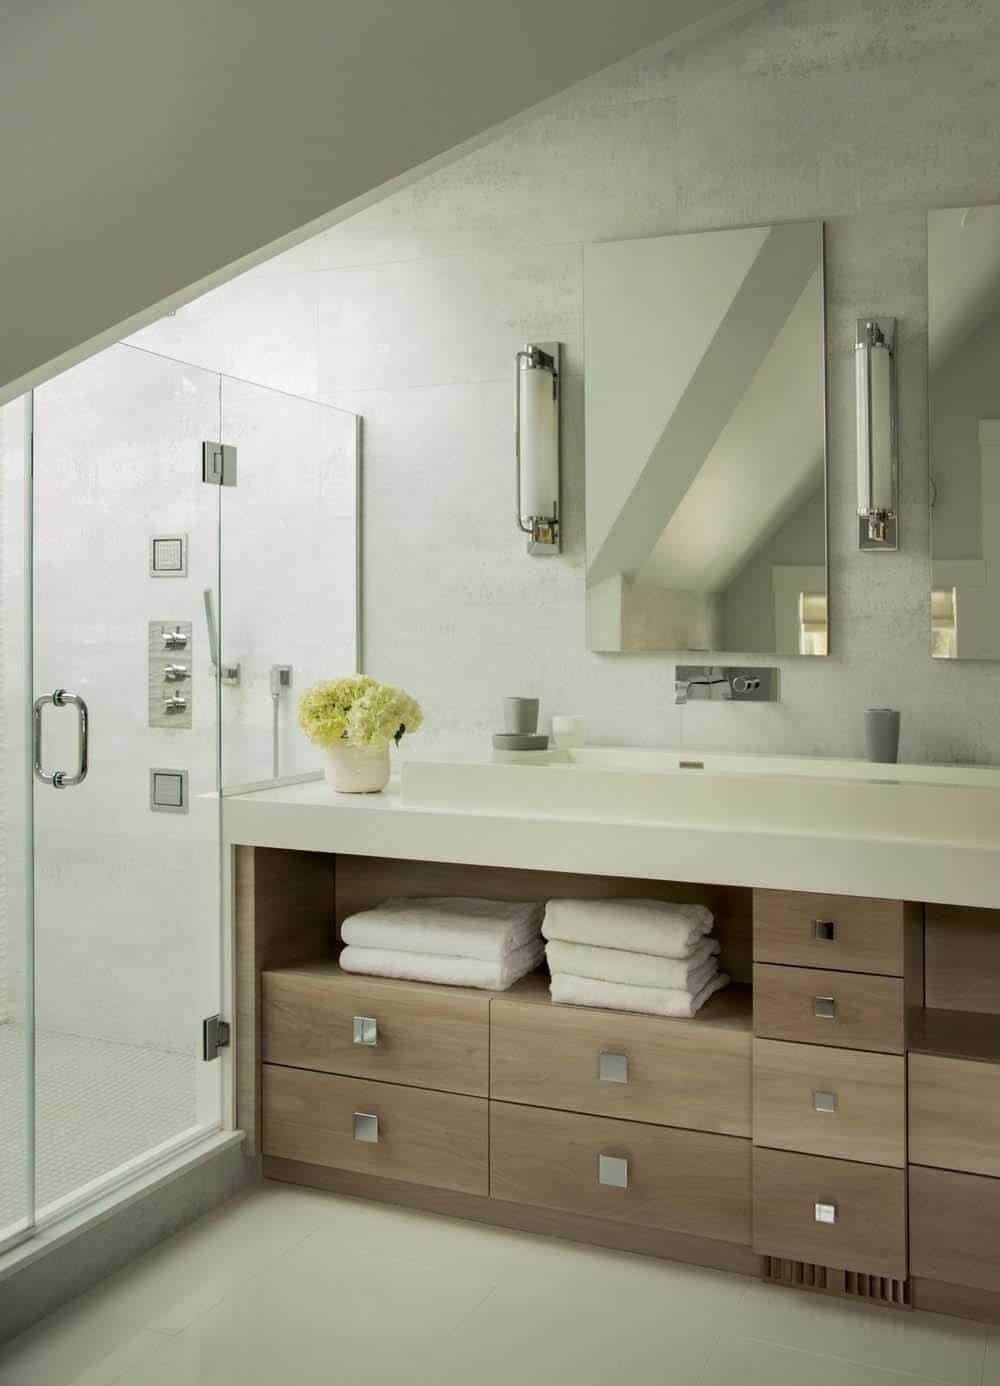 Chatham Retreat-Marthas Vineyard Interior Design-12-1 Kindesign